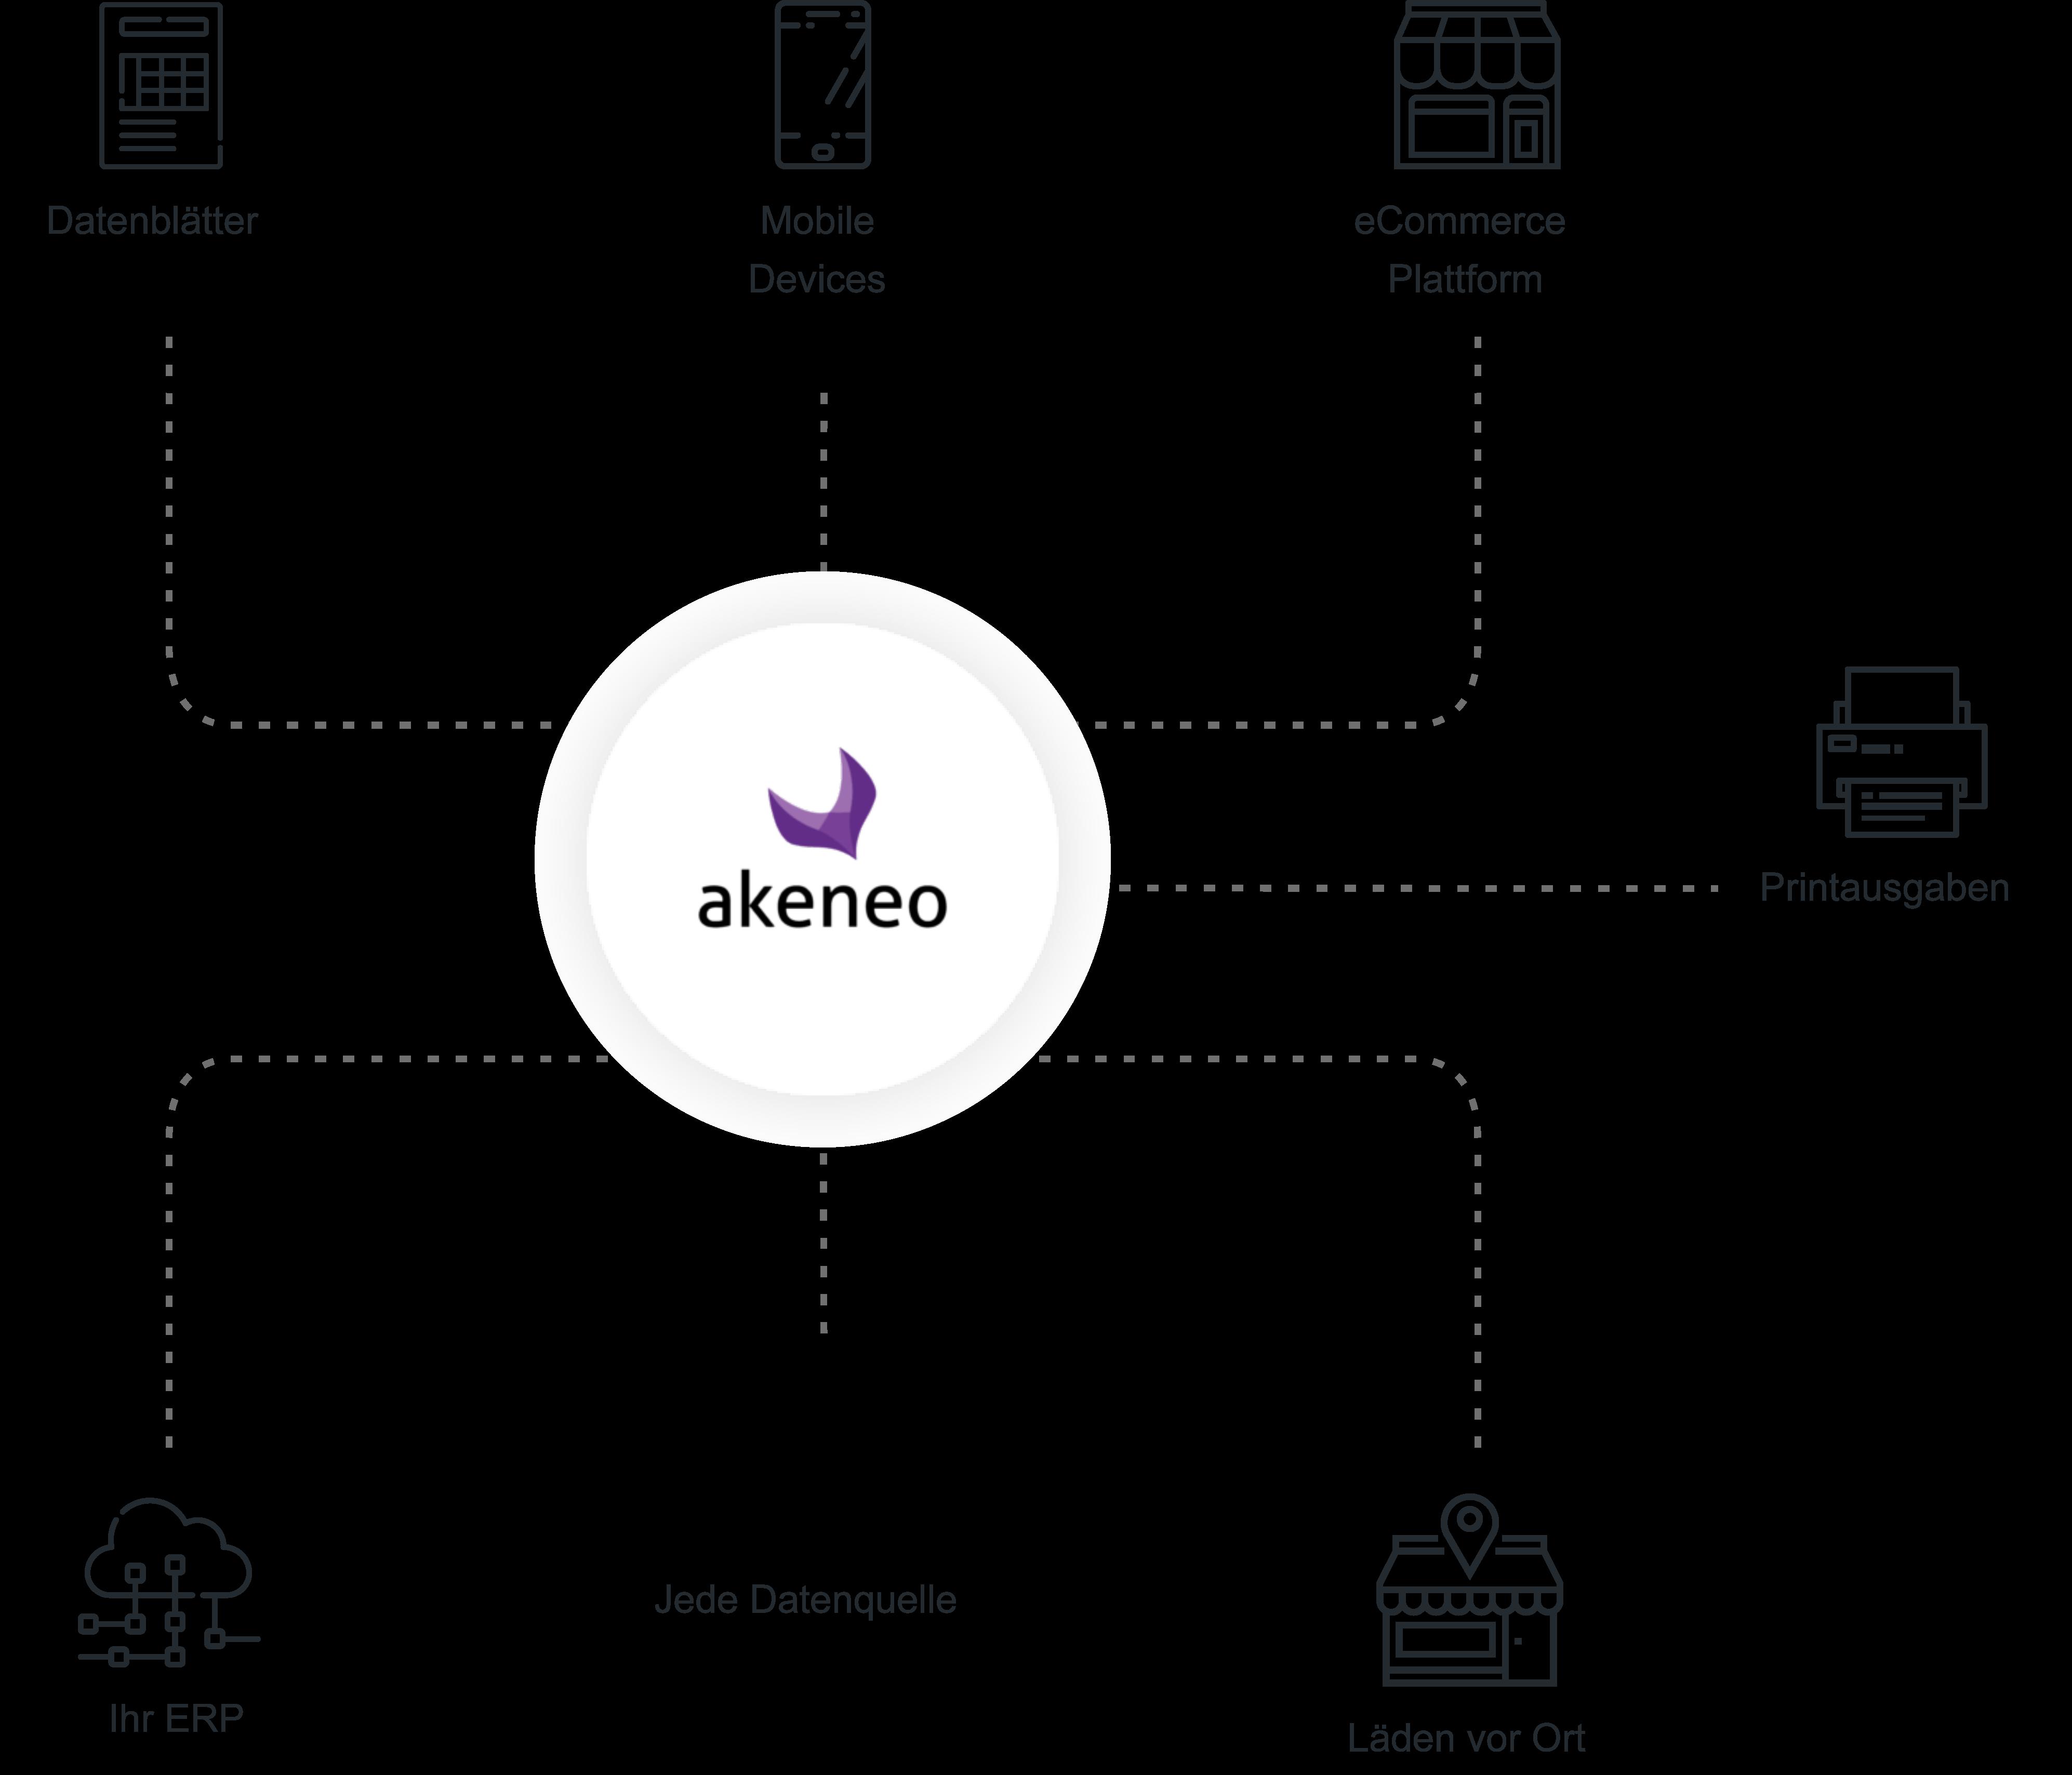 akeneo ecosystem